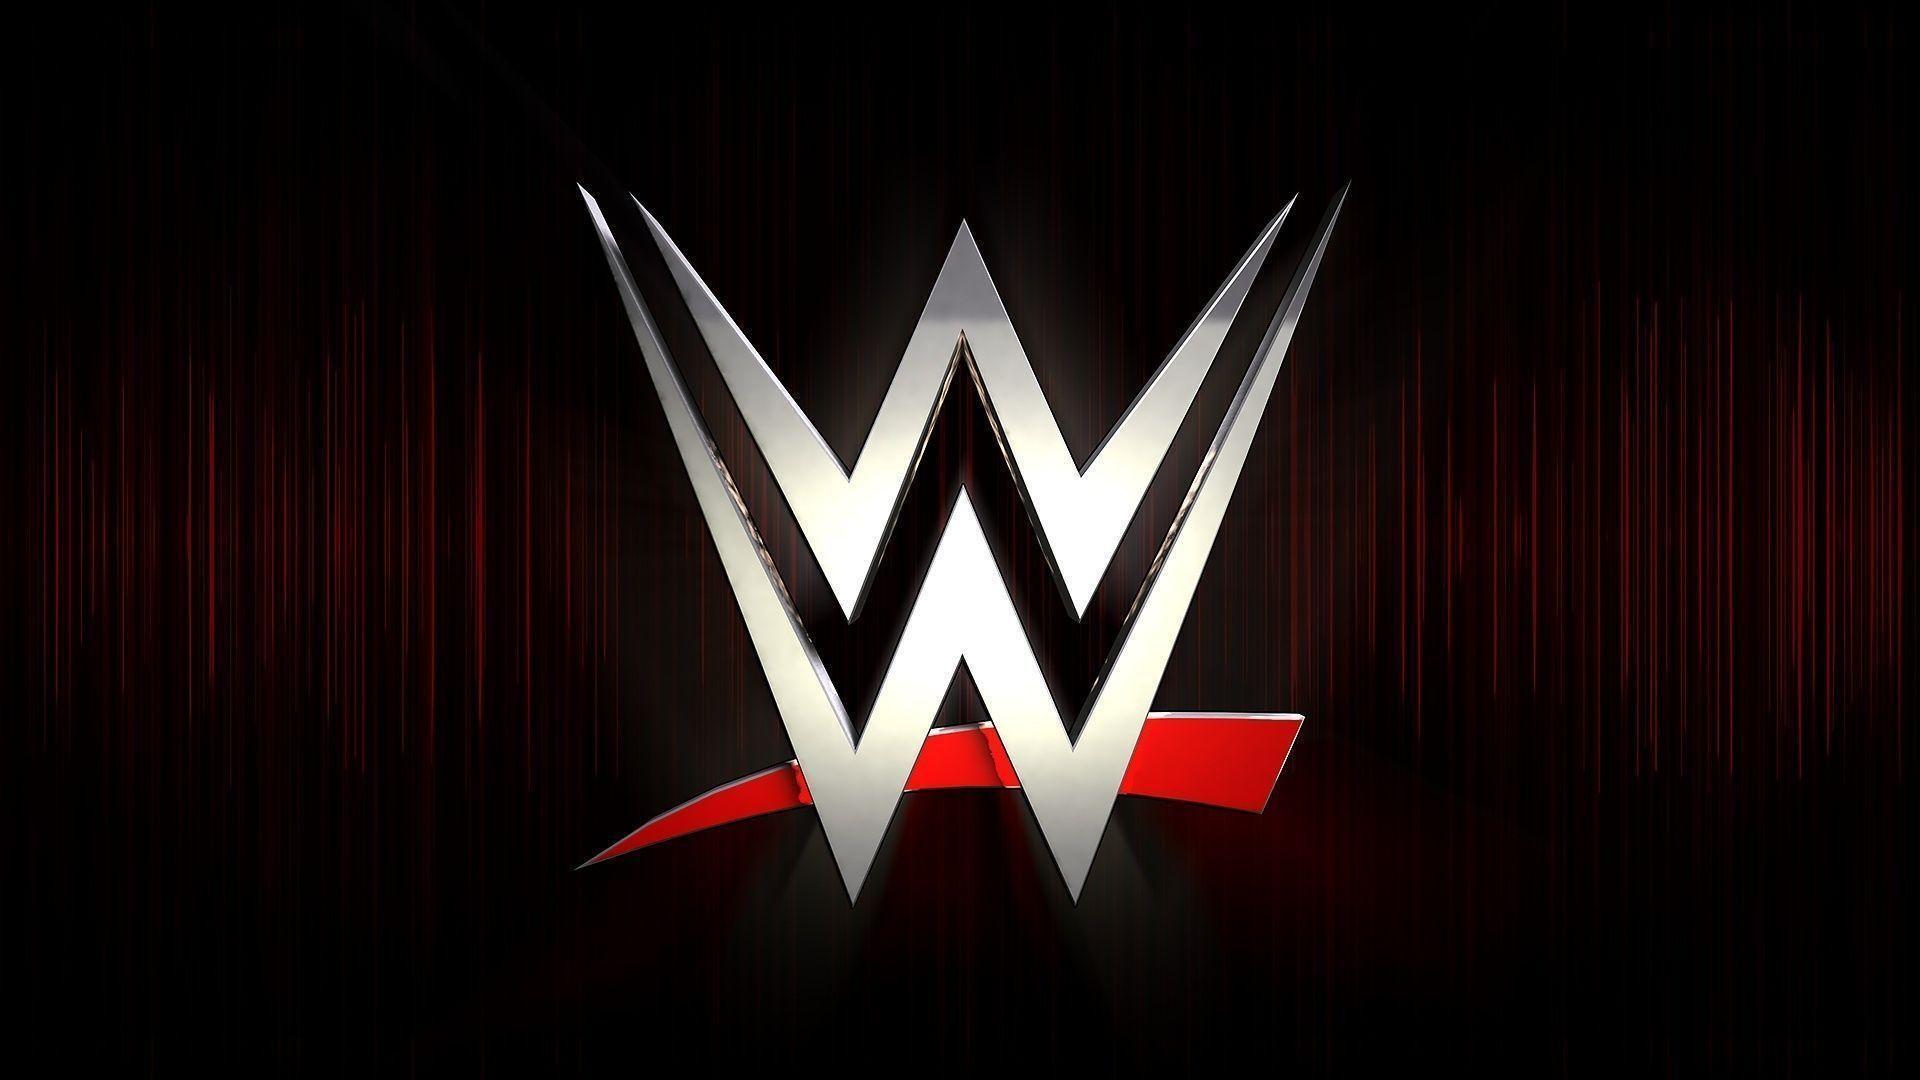 Wwe, Wrestling, Wrestling Logo, Wwe Logo Wallpapers and .